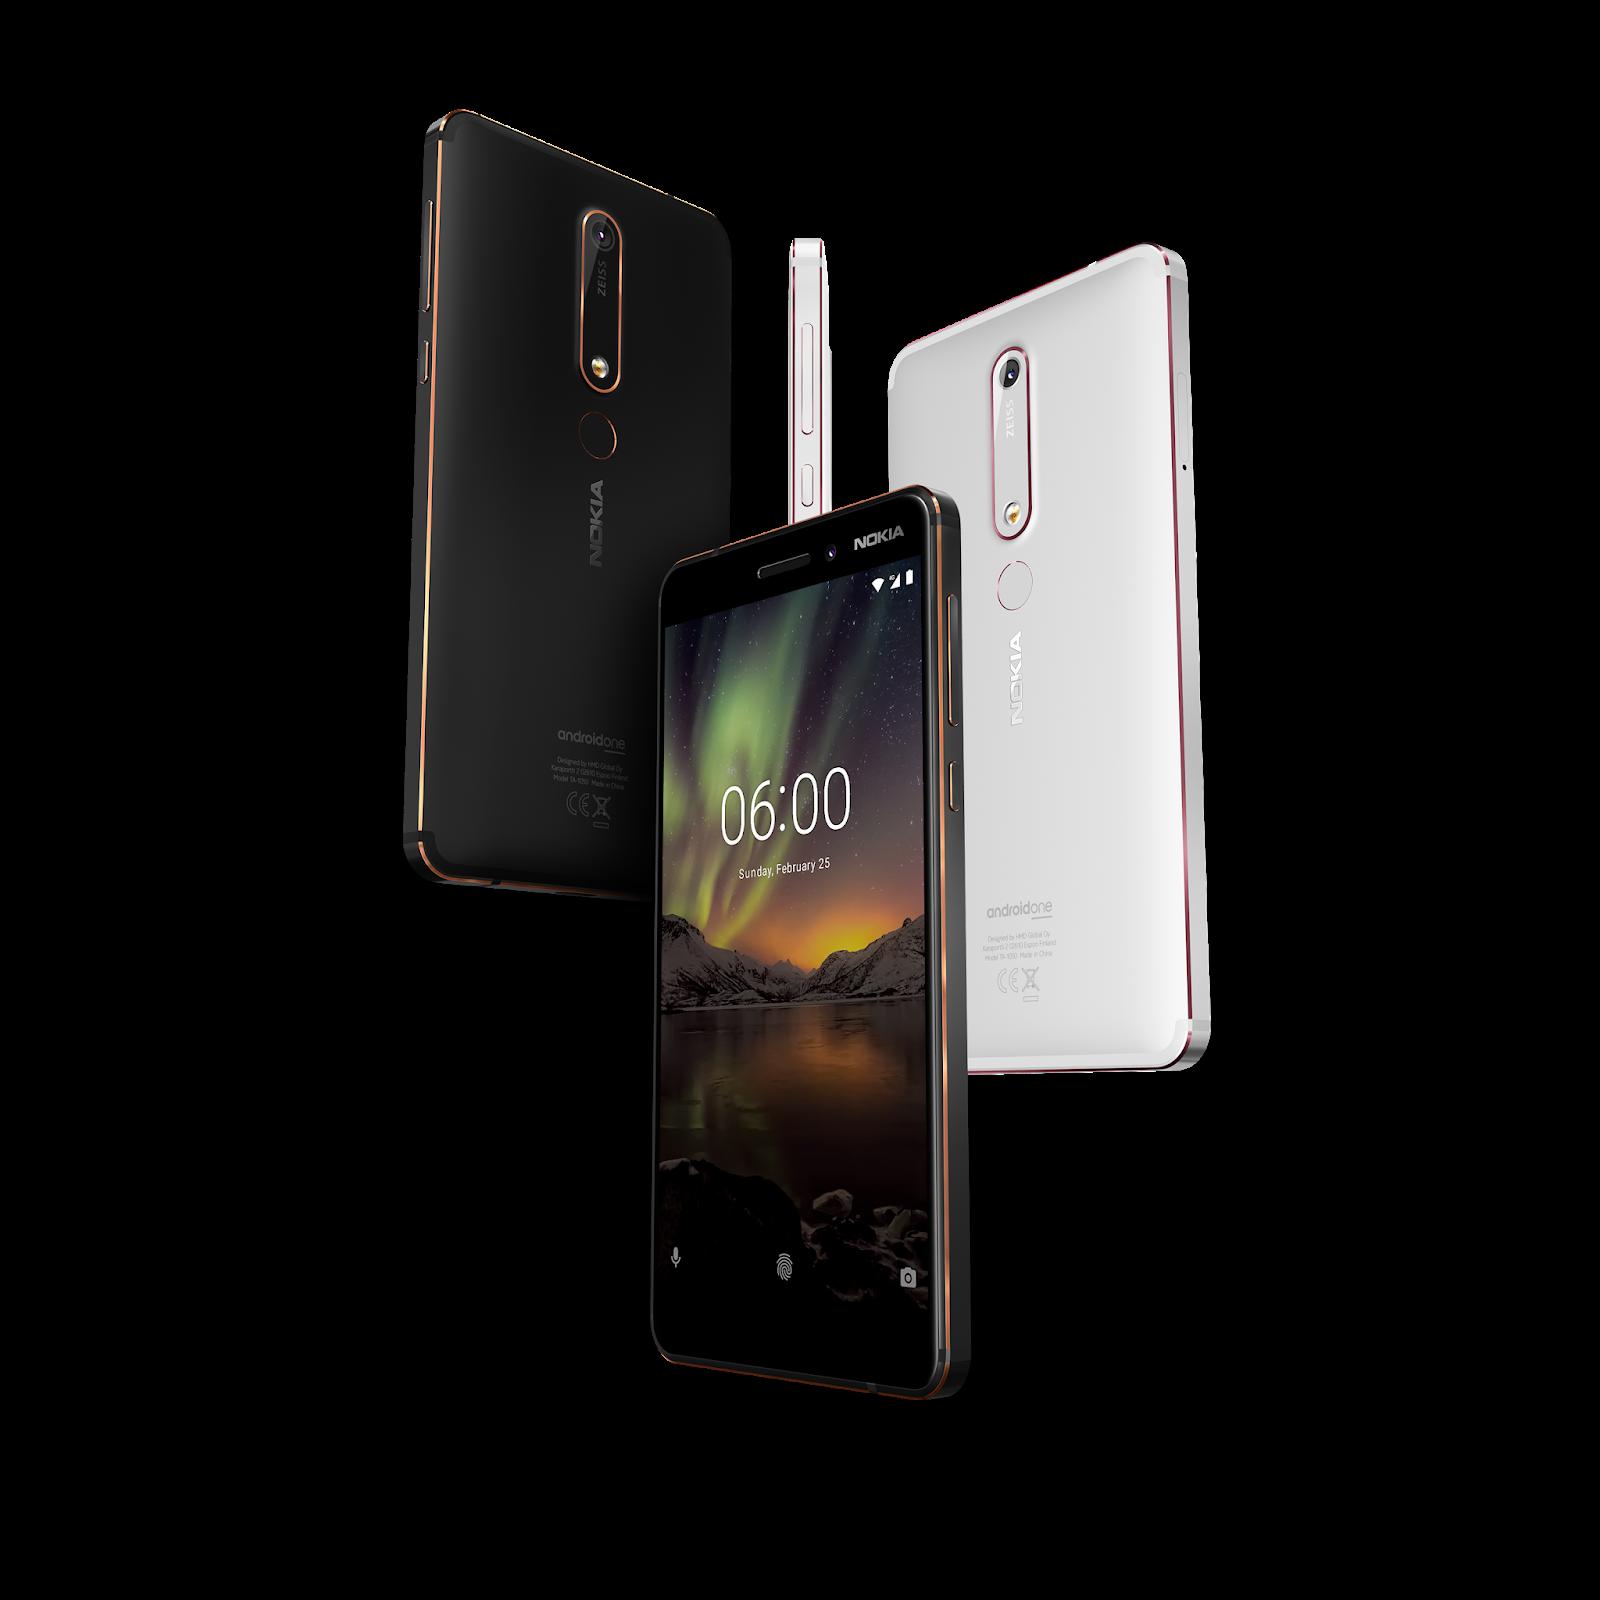 Nokia 6 2018 edition Nokia 6, Smartphone, Phone